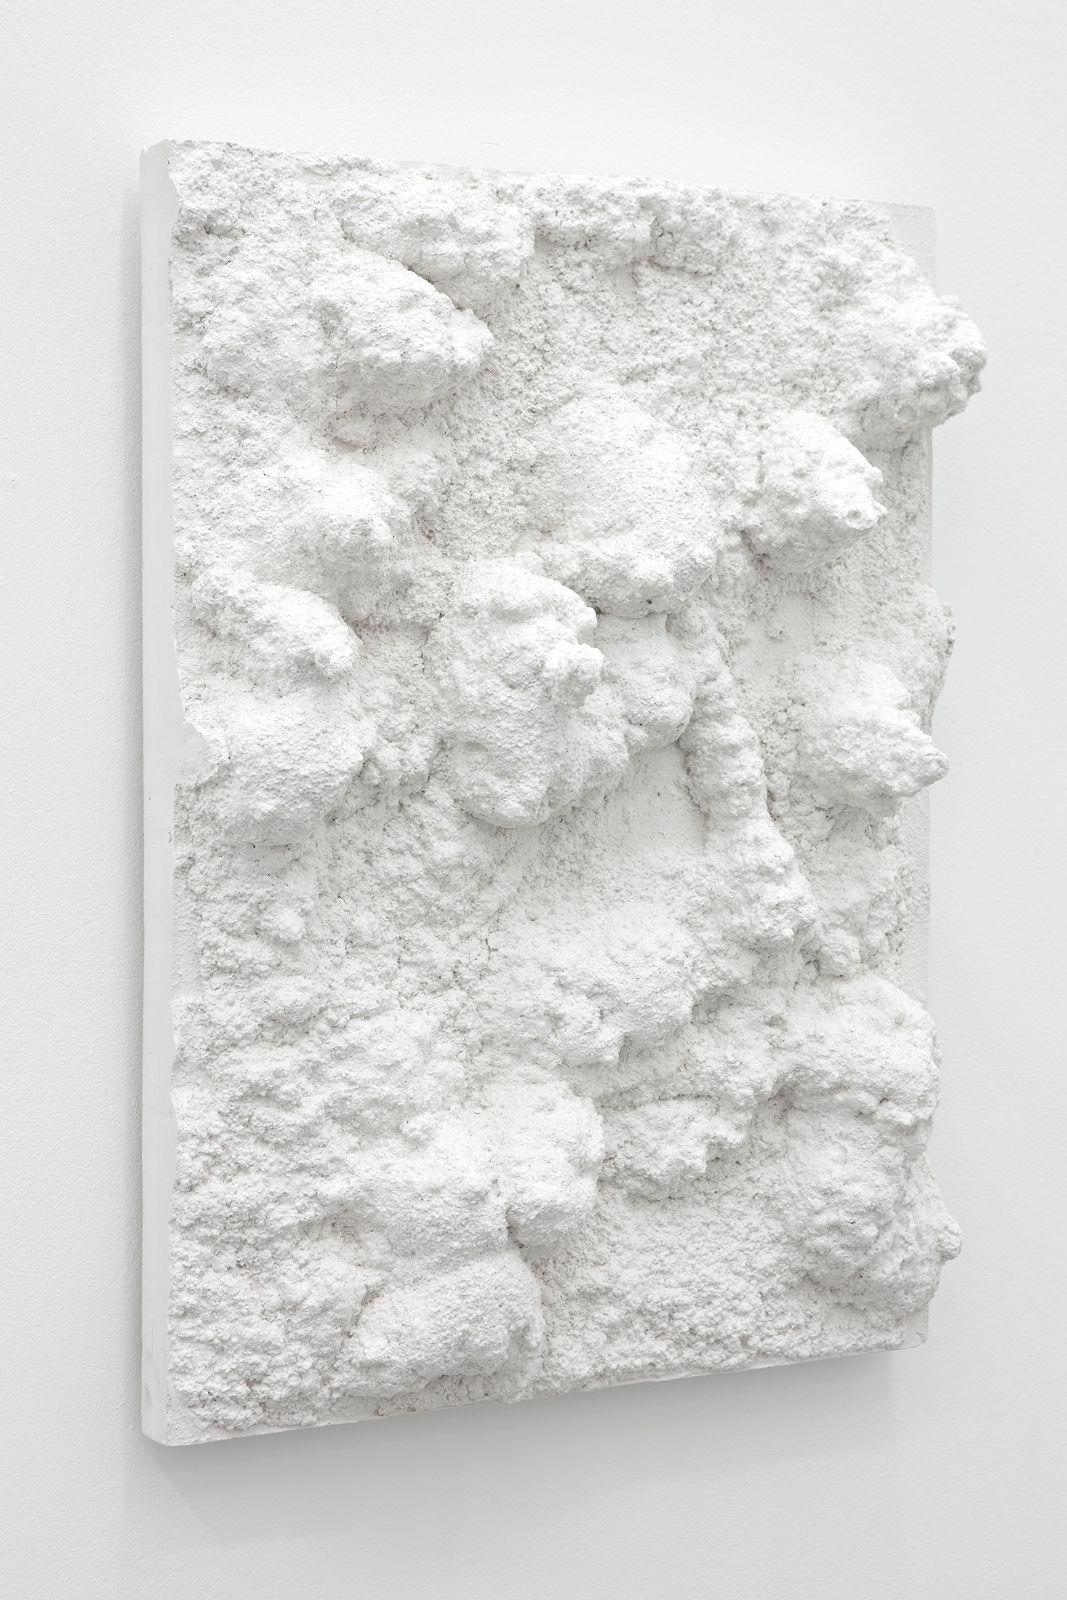 Untitled, 2012, plaster, 60 x 44 x 12,5 cm